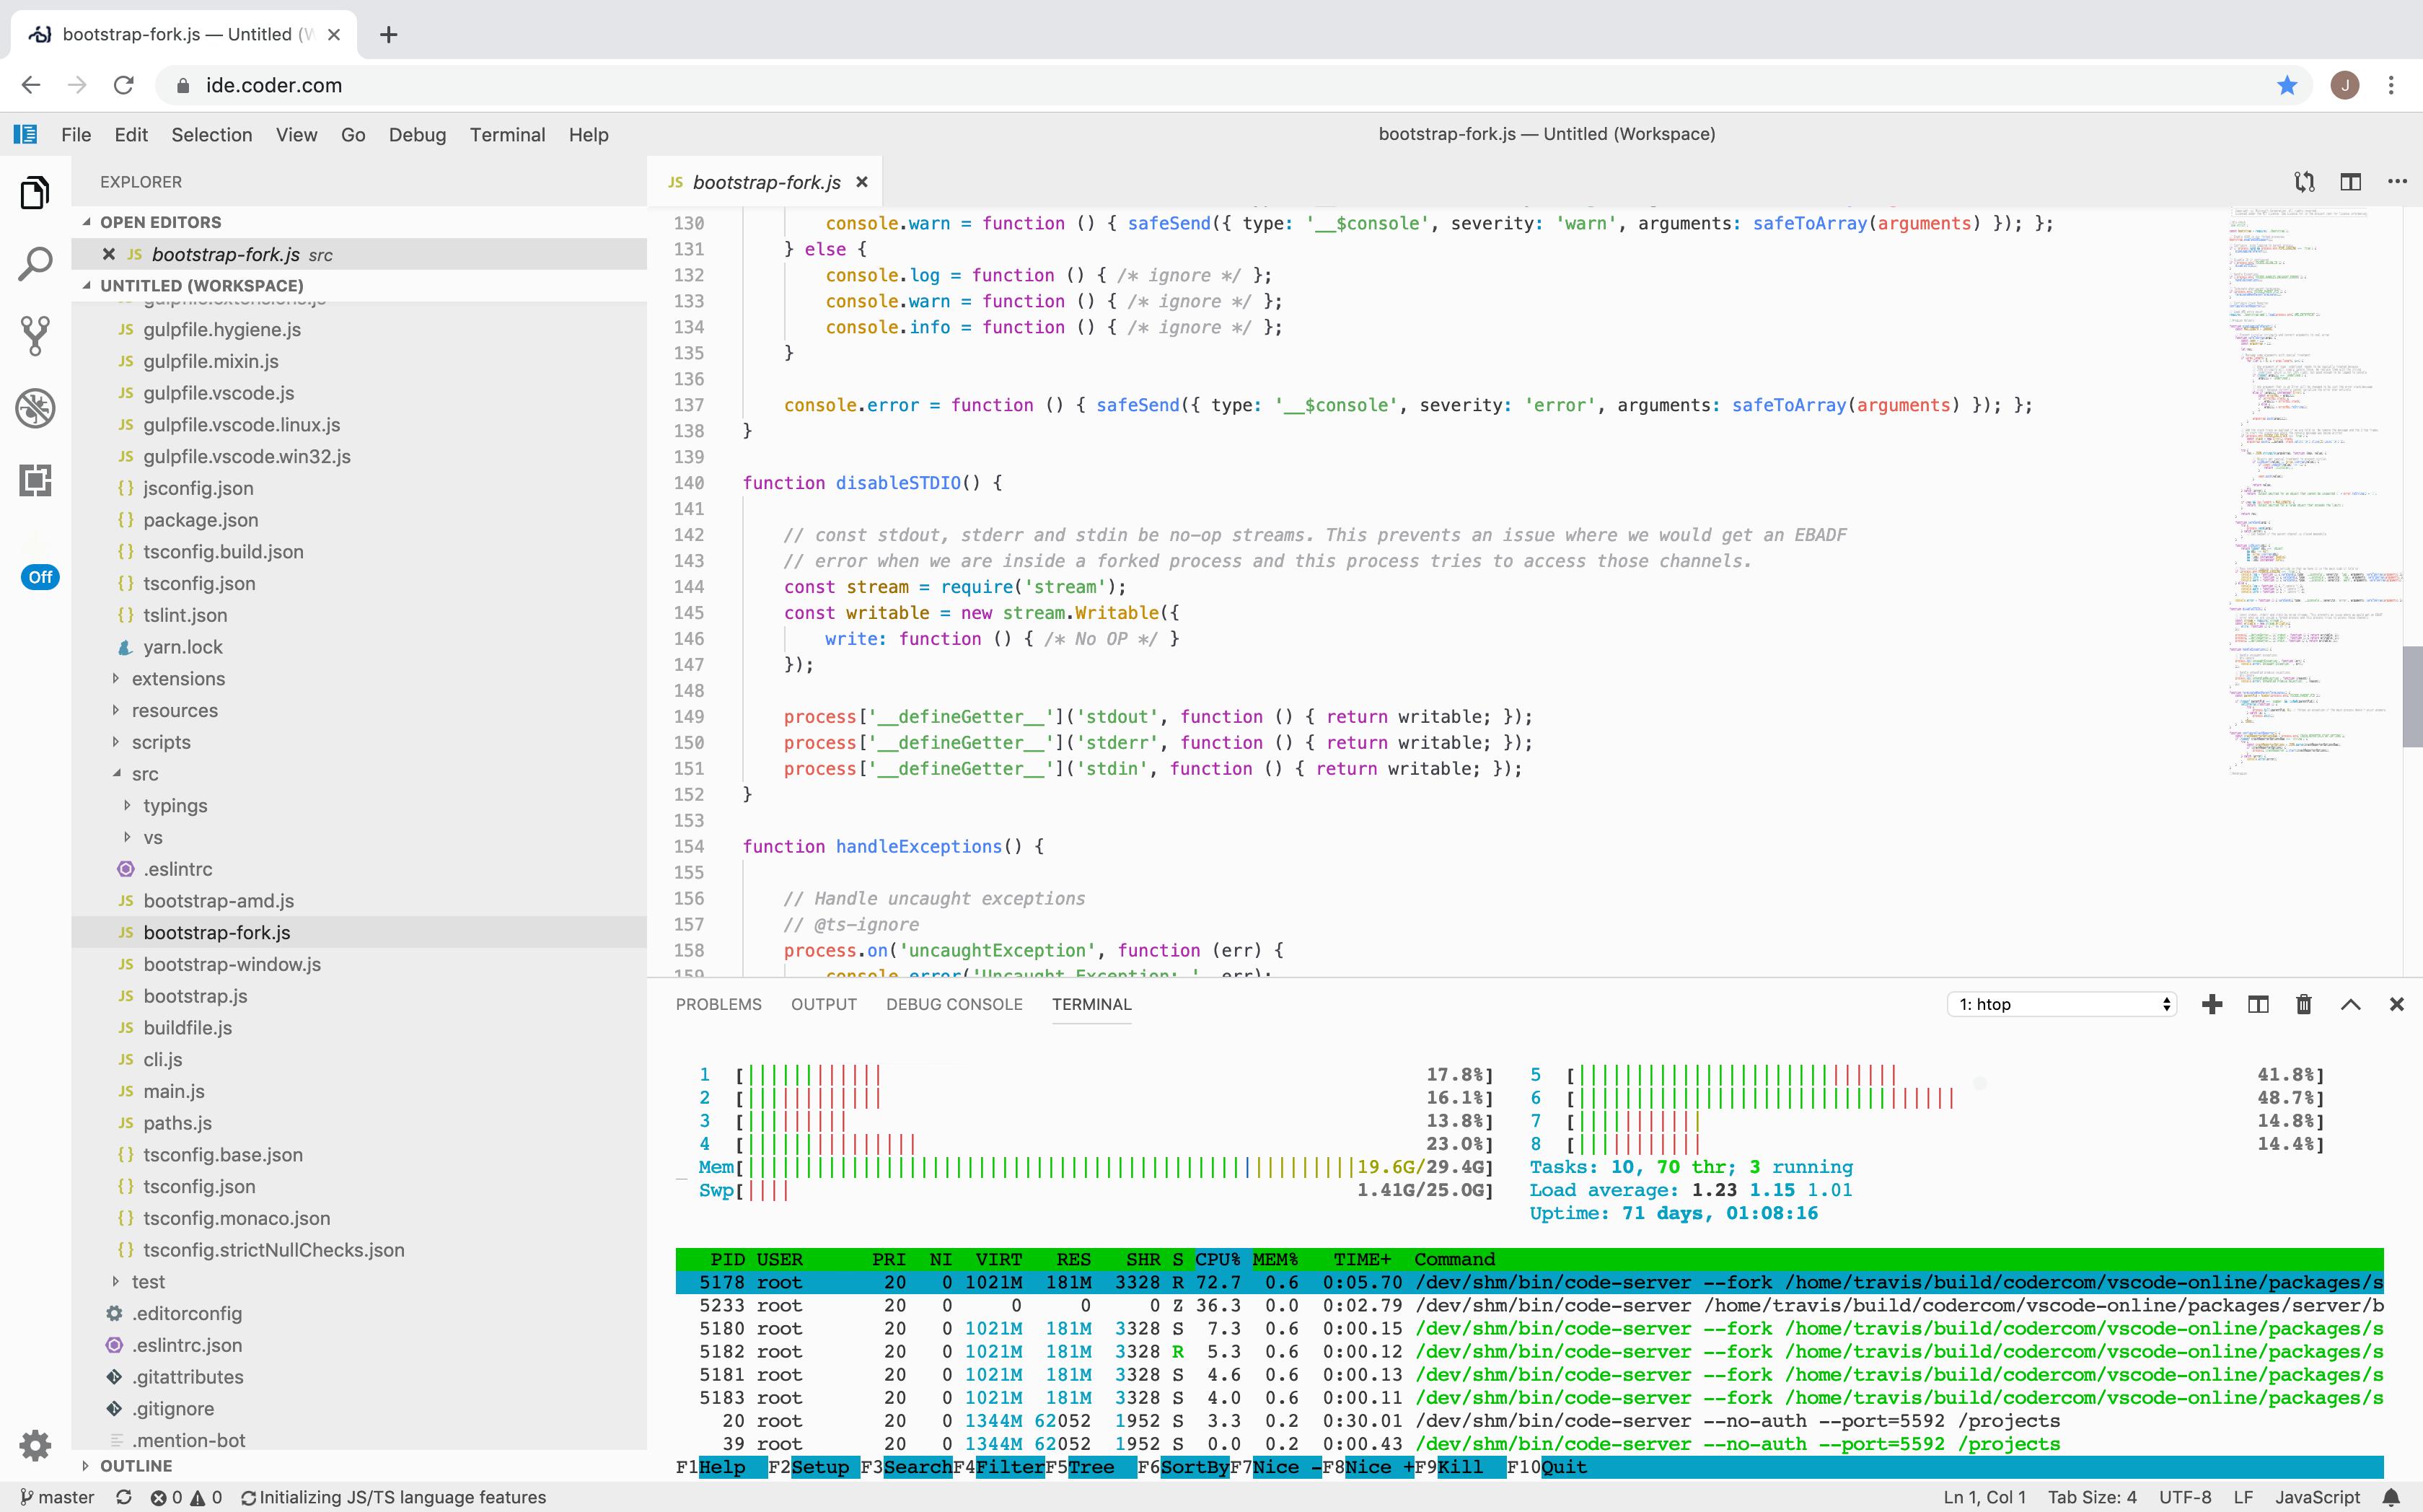 code-server